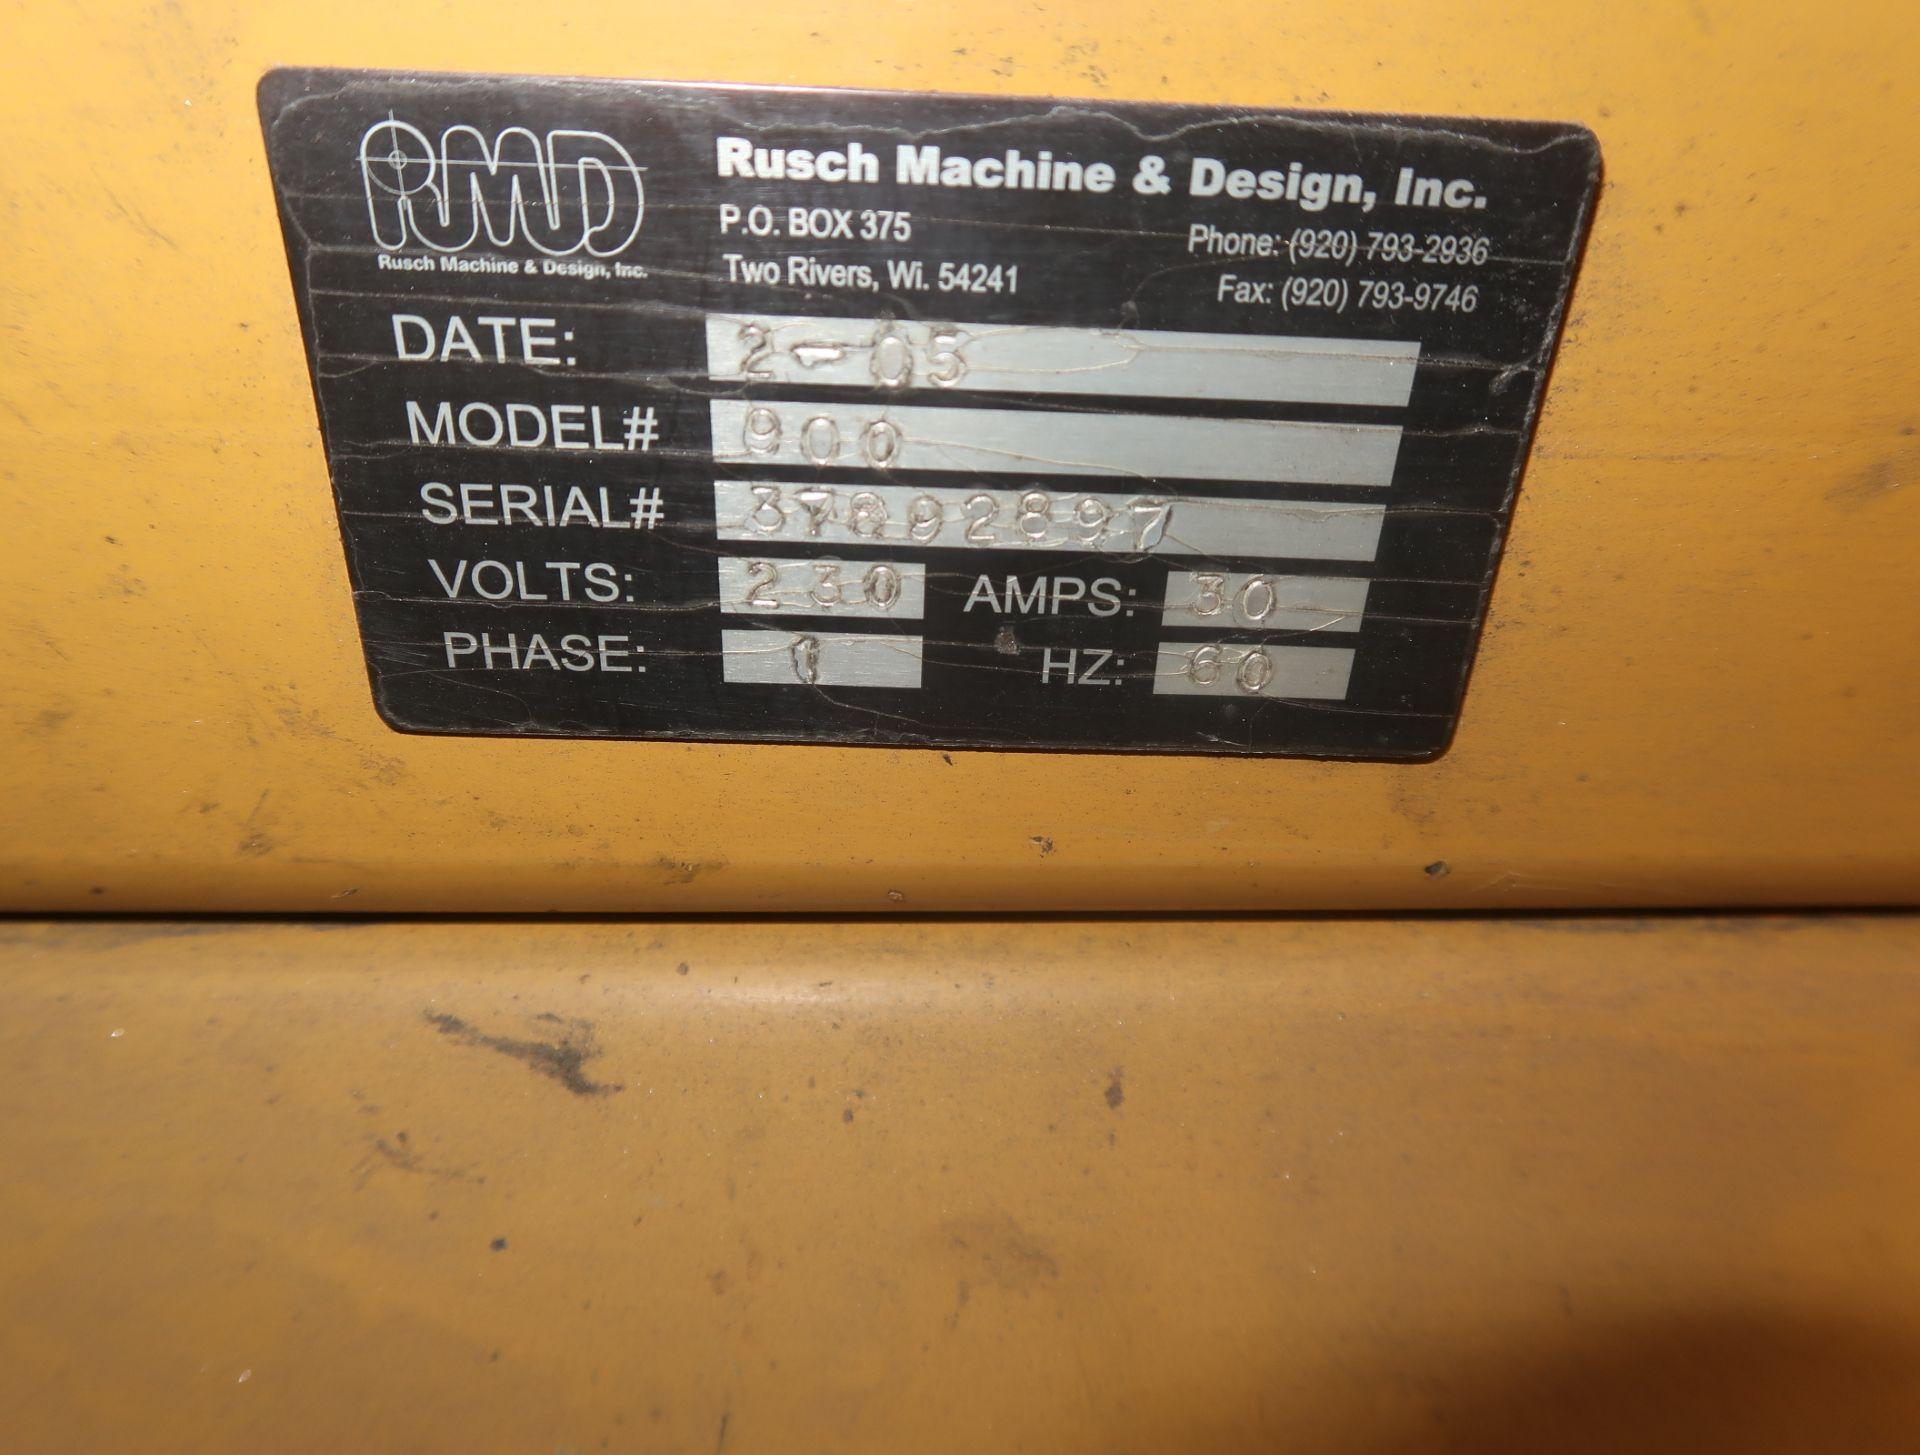 Lot 2 - RUSCH MACHINE & DESIGN INC. TUBE ANGLE NOTCHER MDL. 900 SN. 37892897